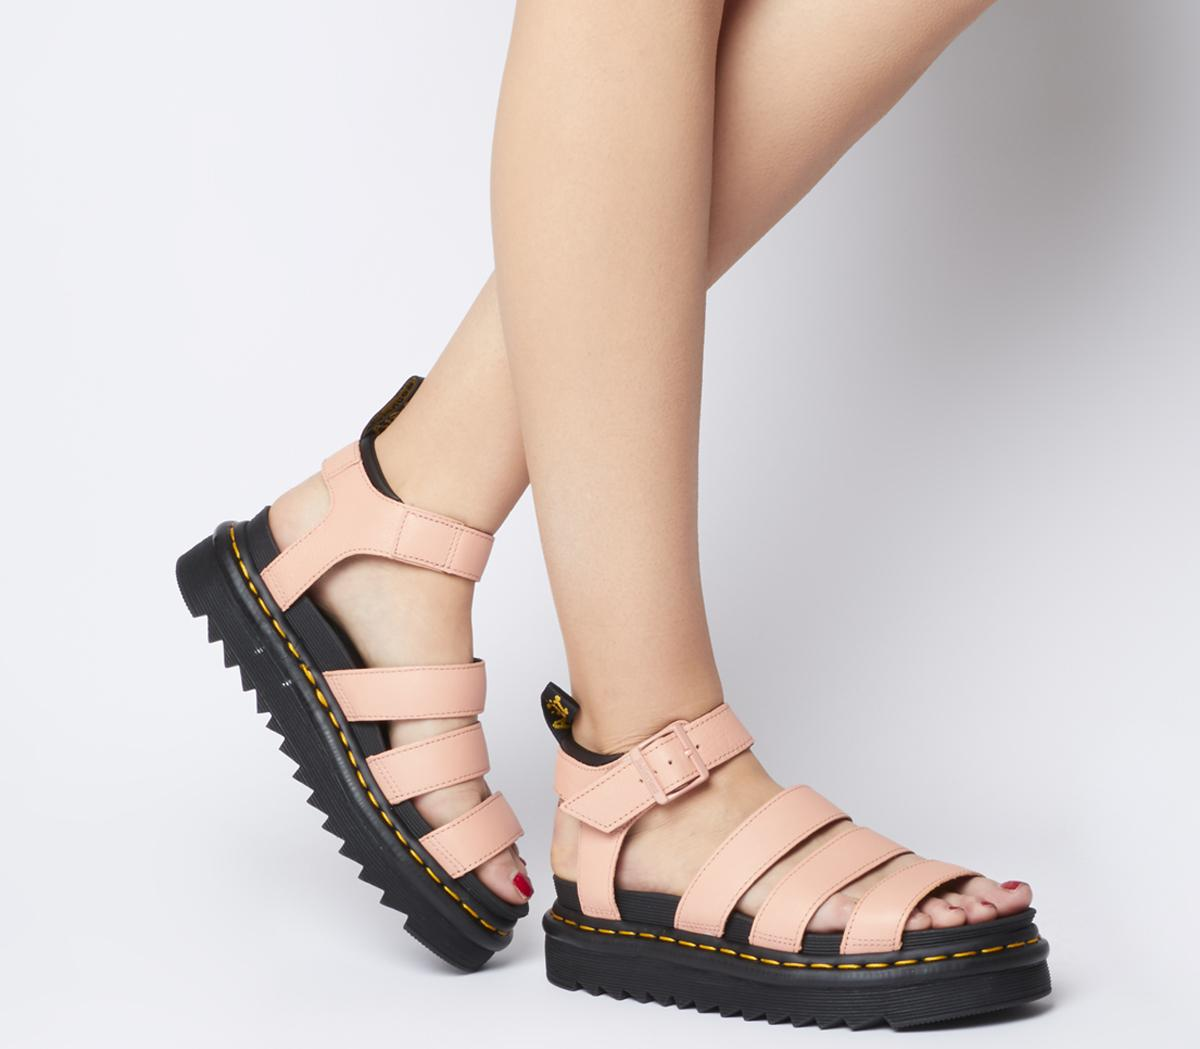 pink dm sandals \u003e Clearance shop